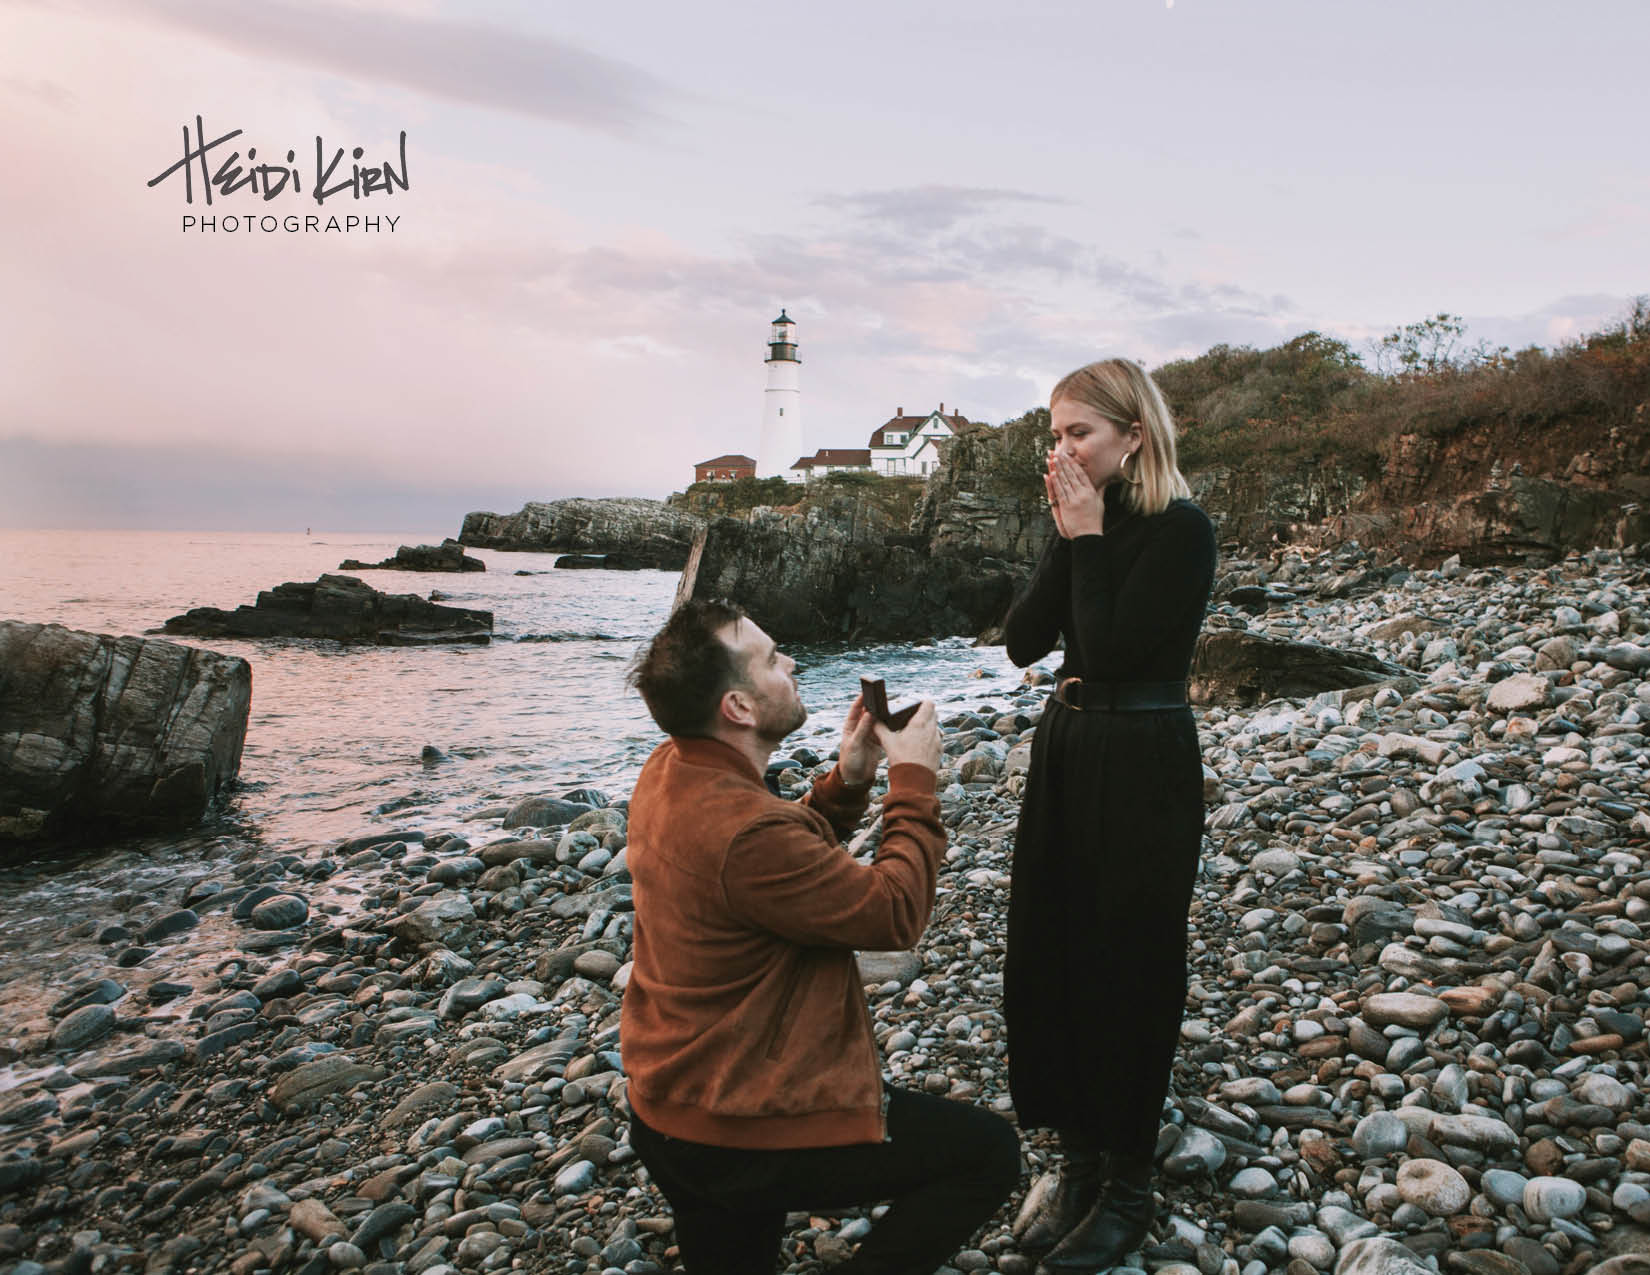 Heidi Kirn Photography _ Surprise Proposal 2019.jpg